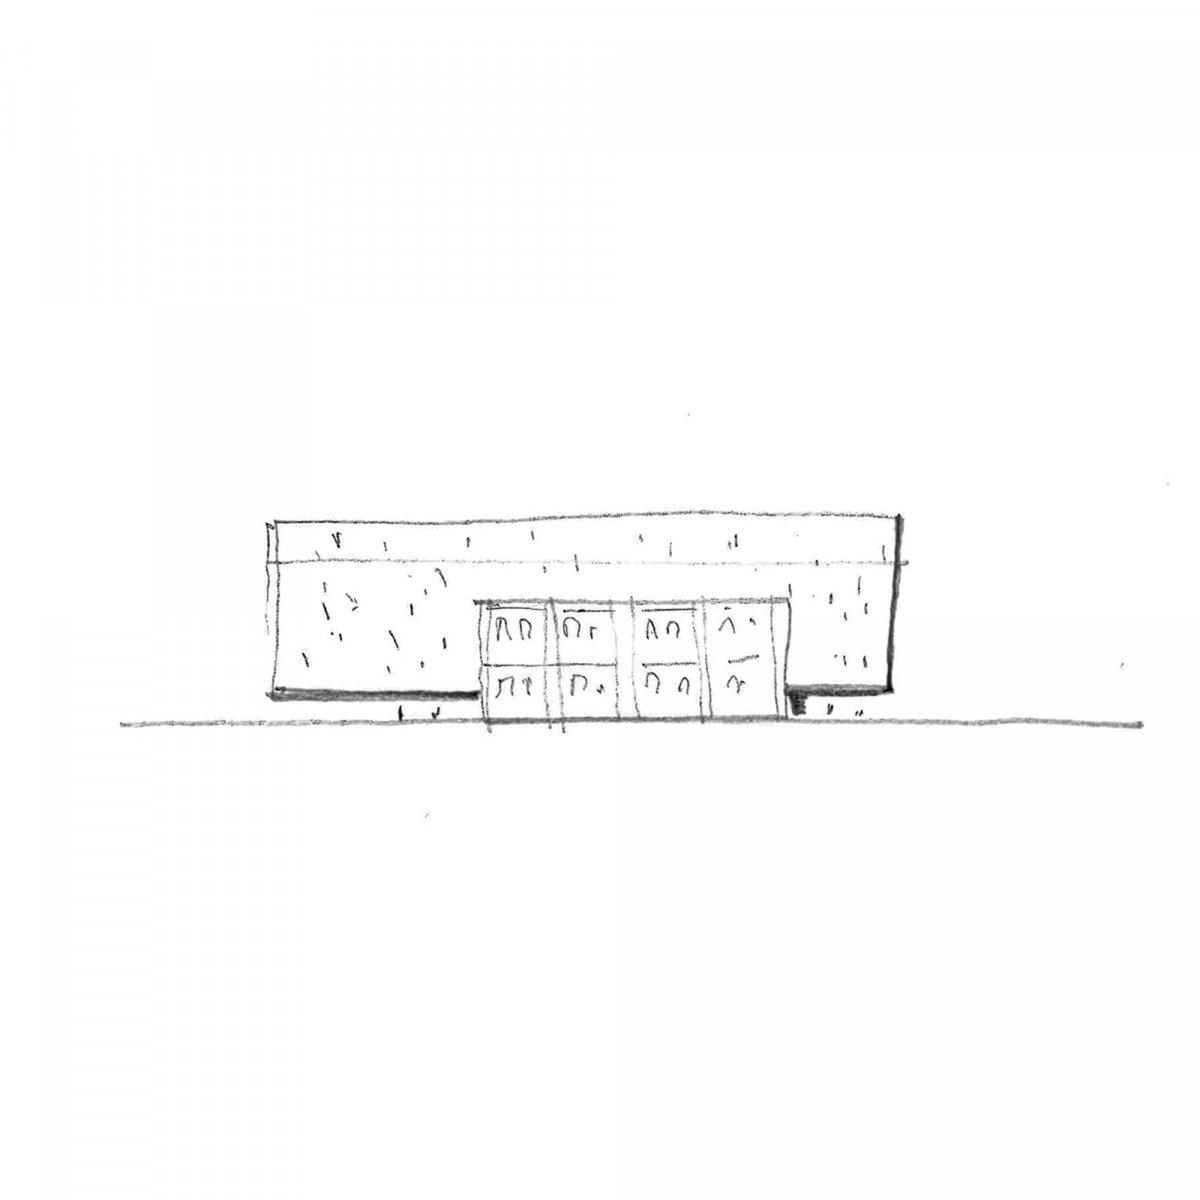 Facade sketch